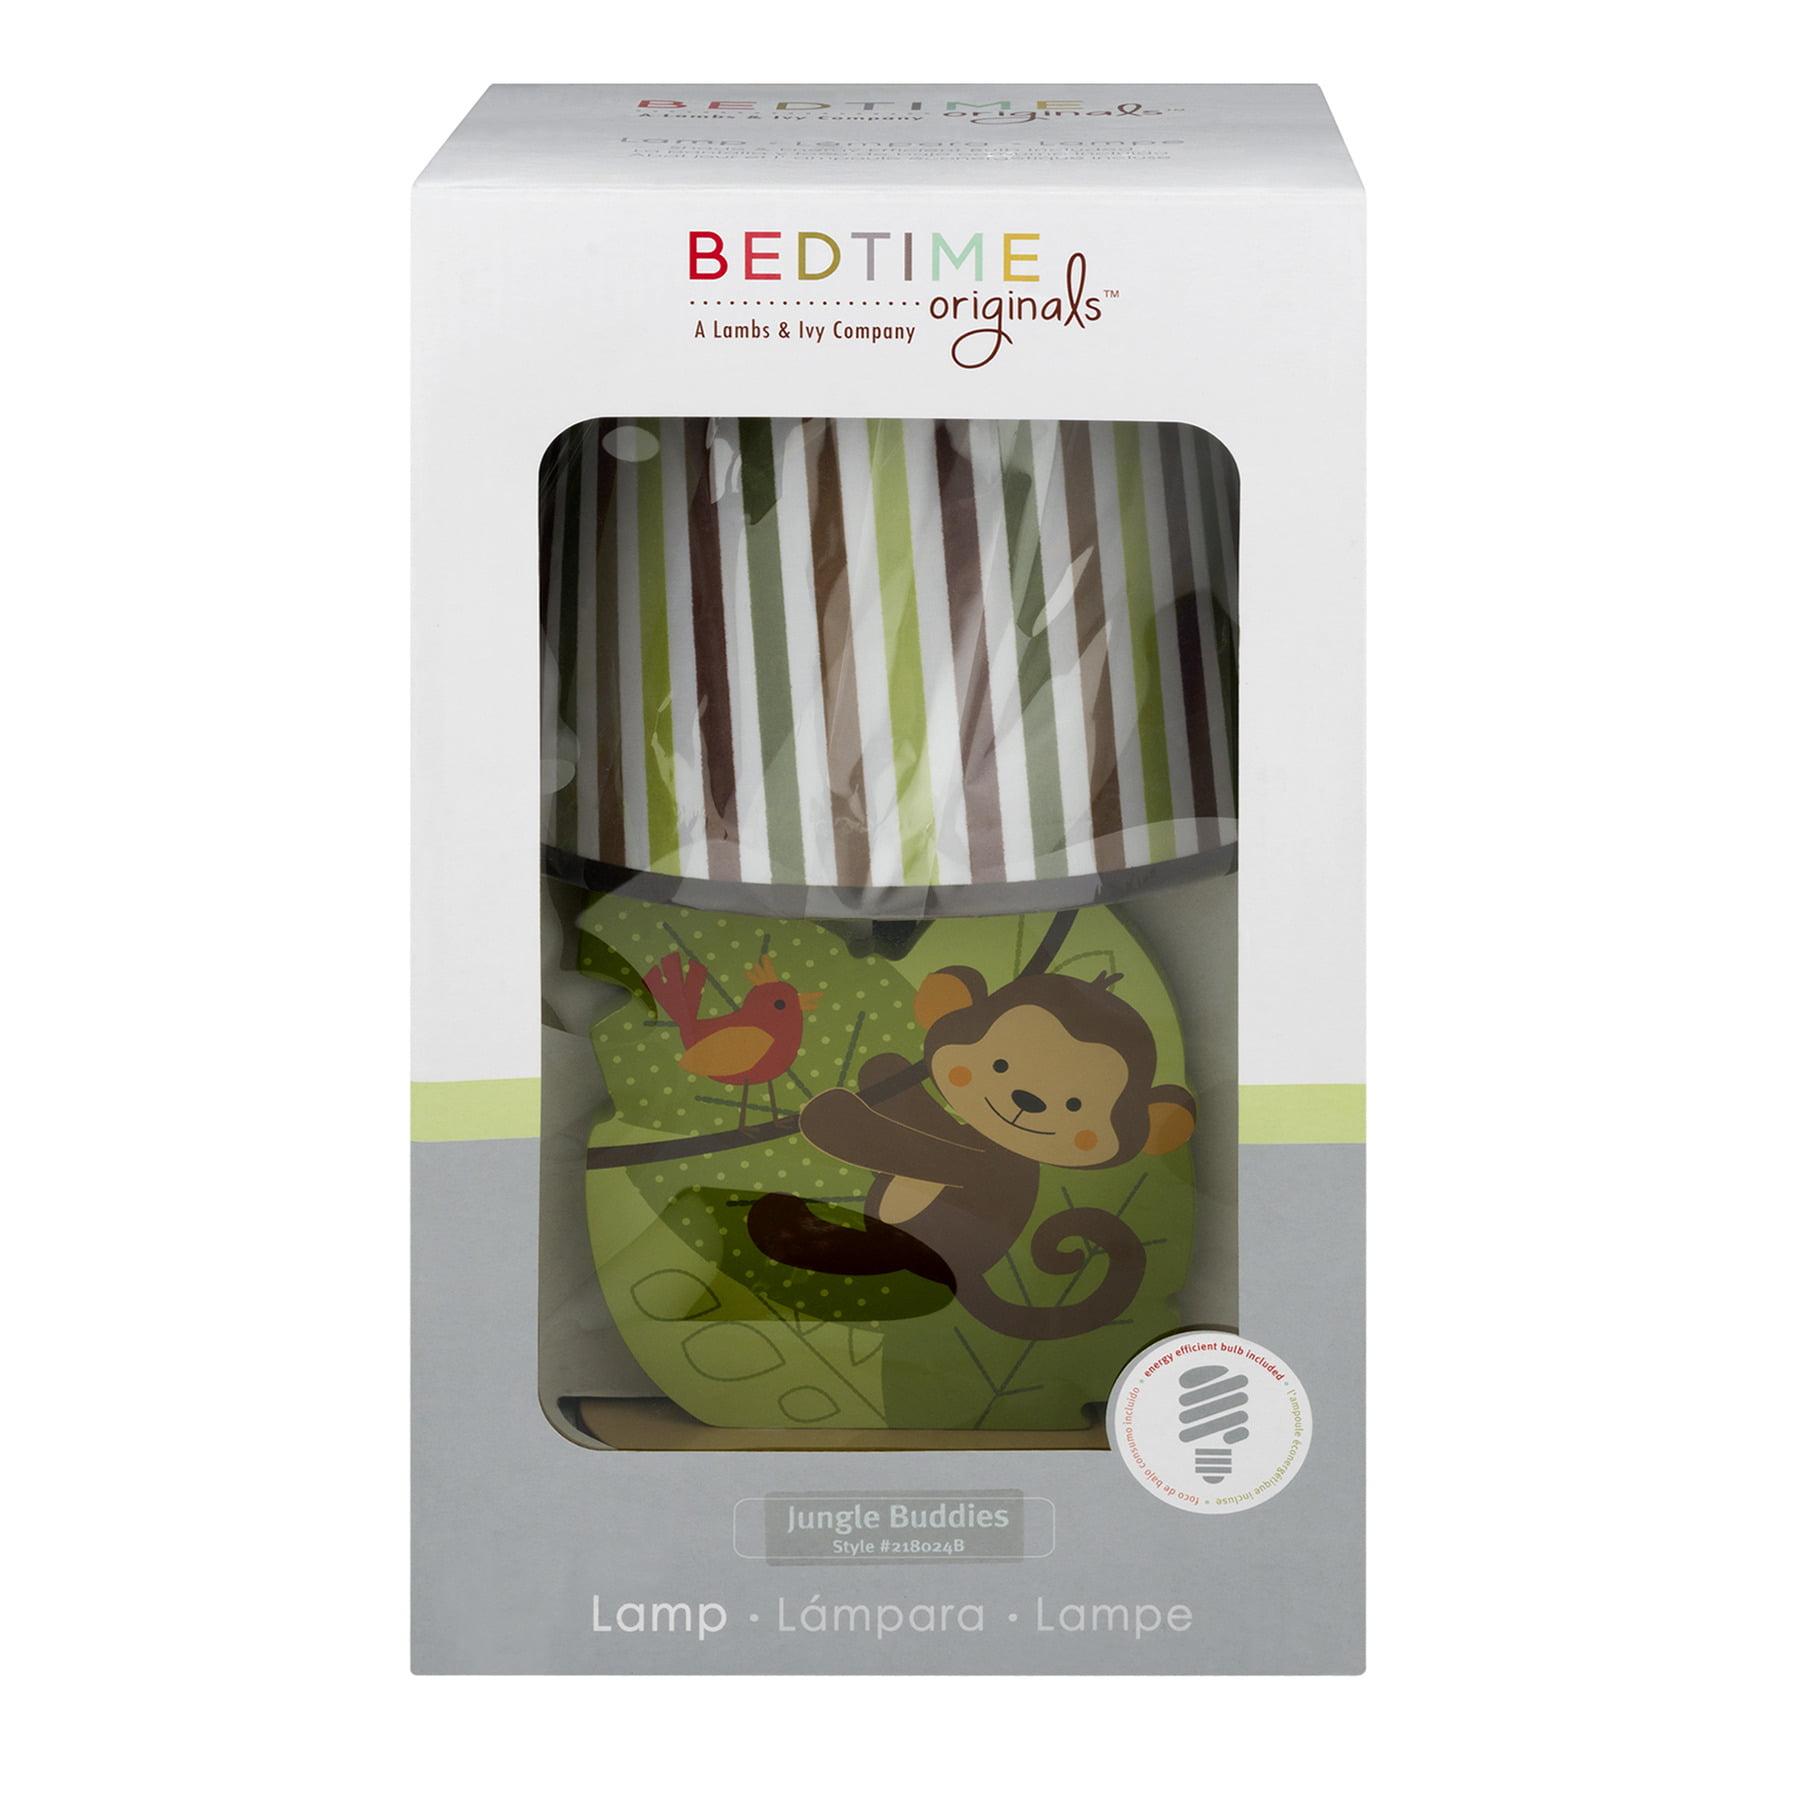 Bedtime Originals Lamp Jungle Buddies - 1.0 CT1.0 CT